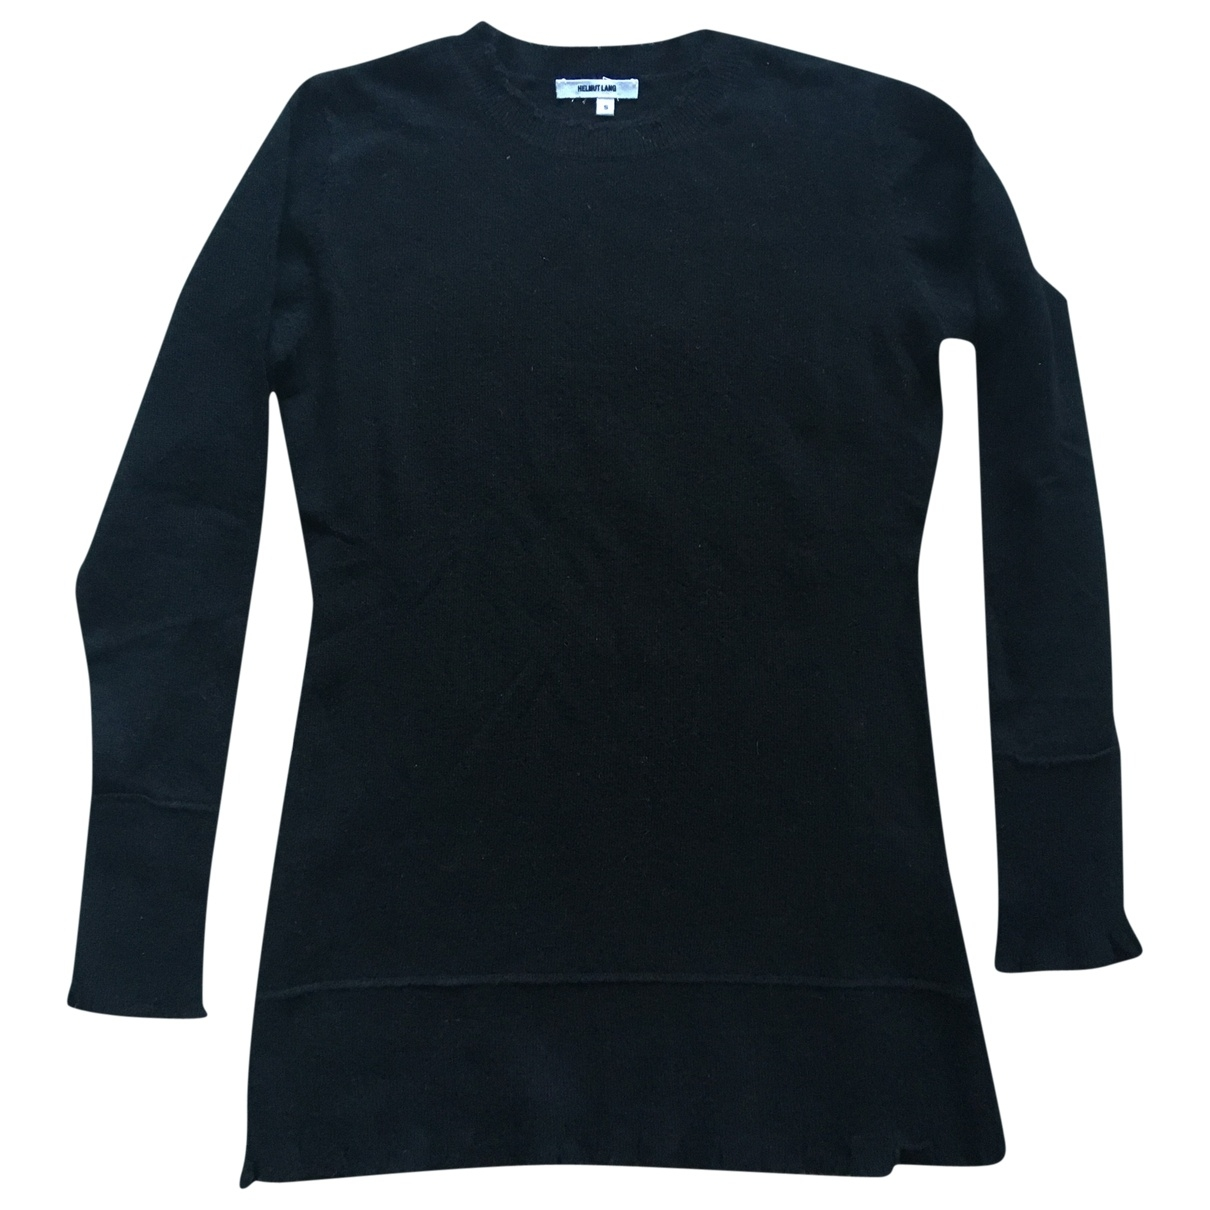 Helmut Lang \N Black Cashmere Knitwear for Women S International